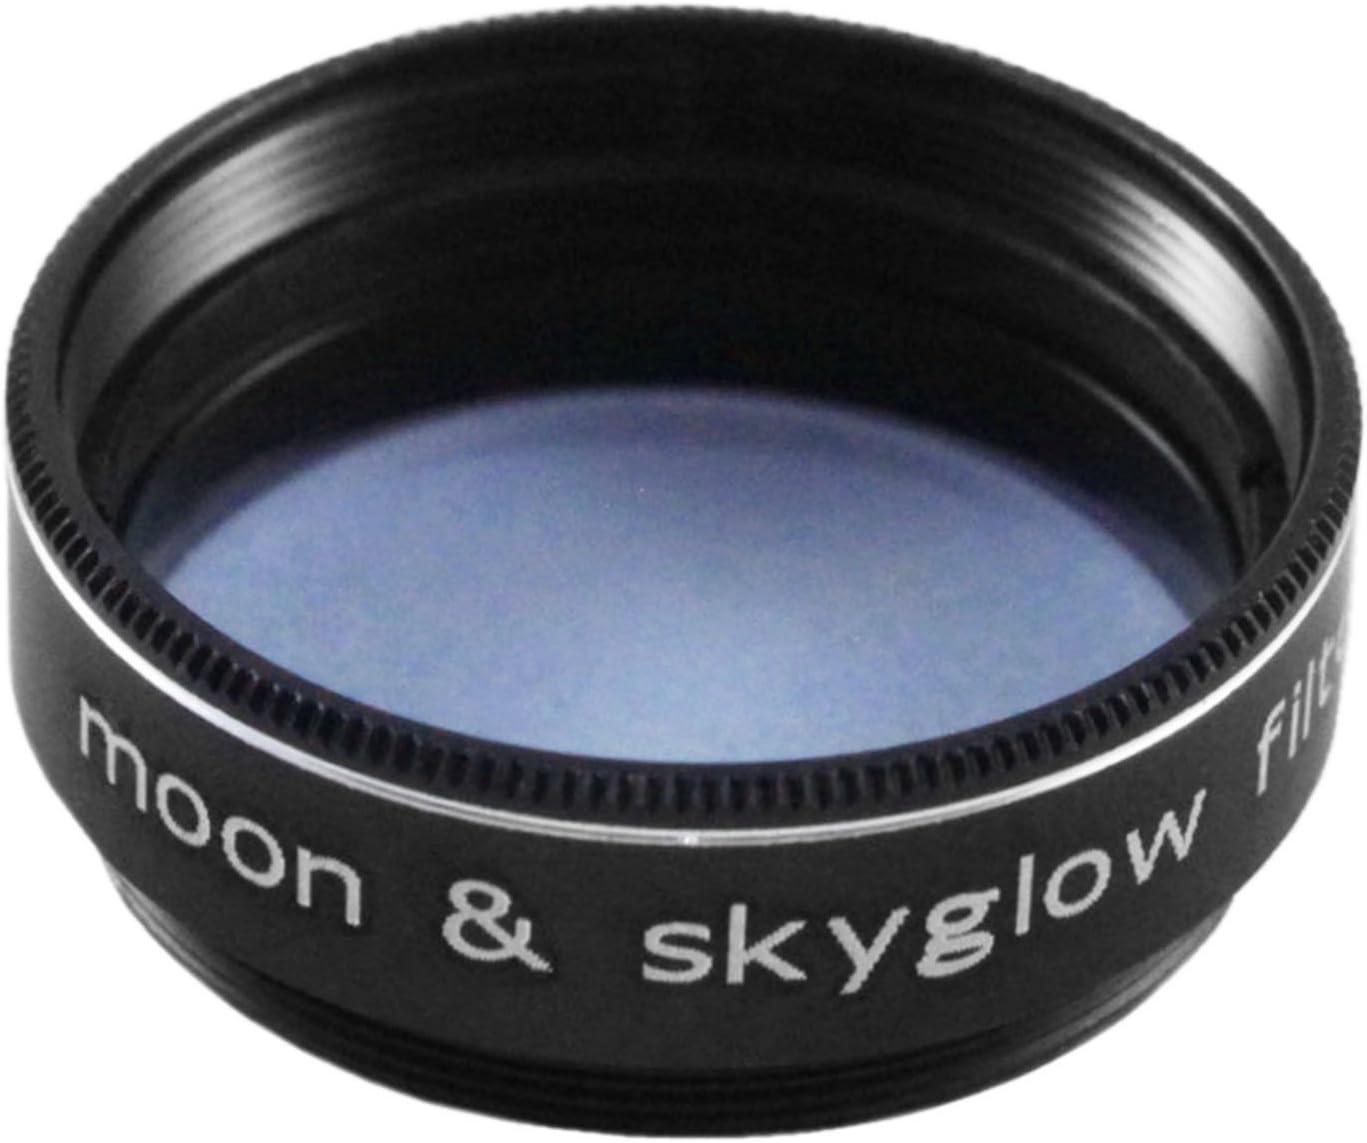 Astromania 1.25 Color//Planetary Filter #15 Yellow-Orange